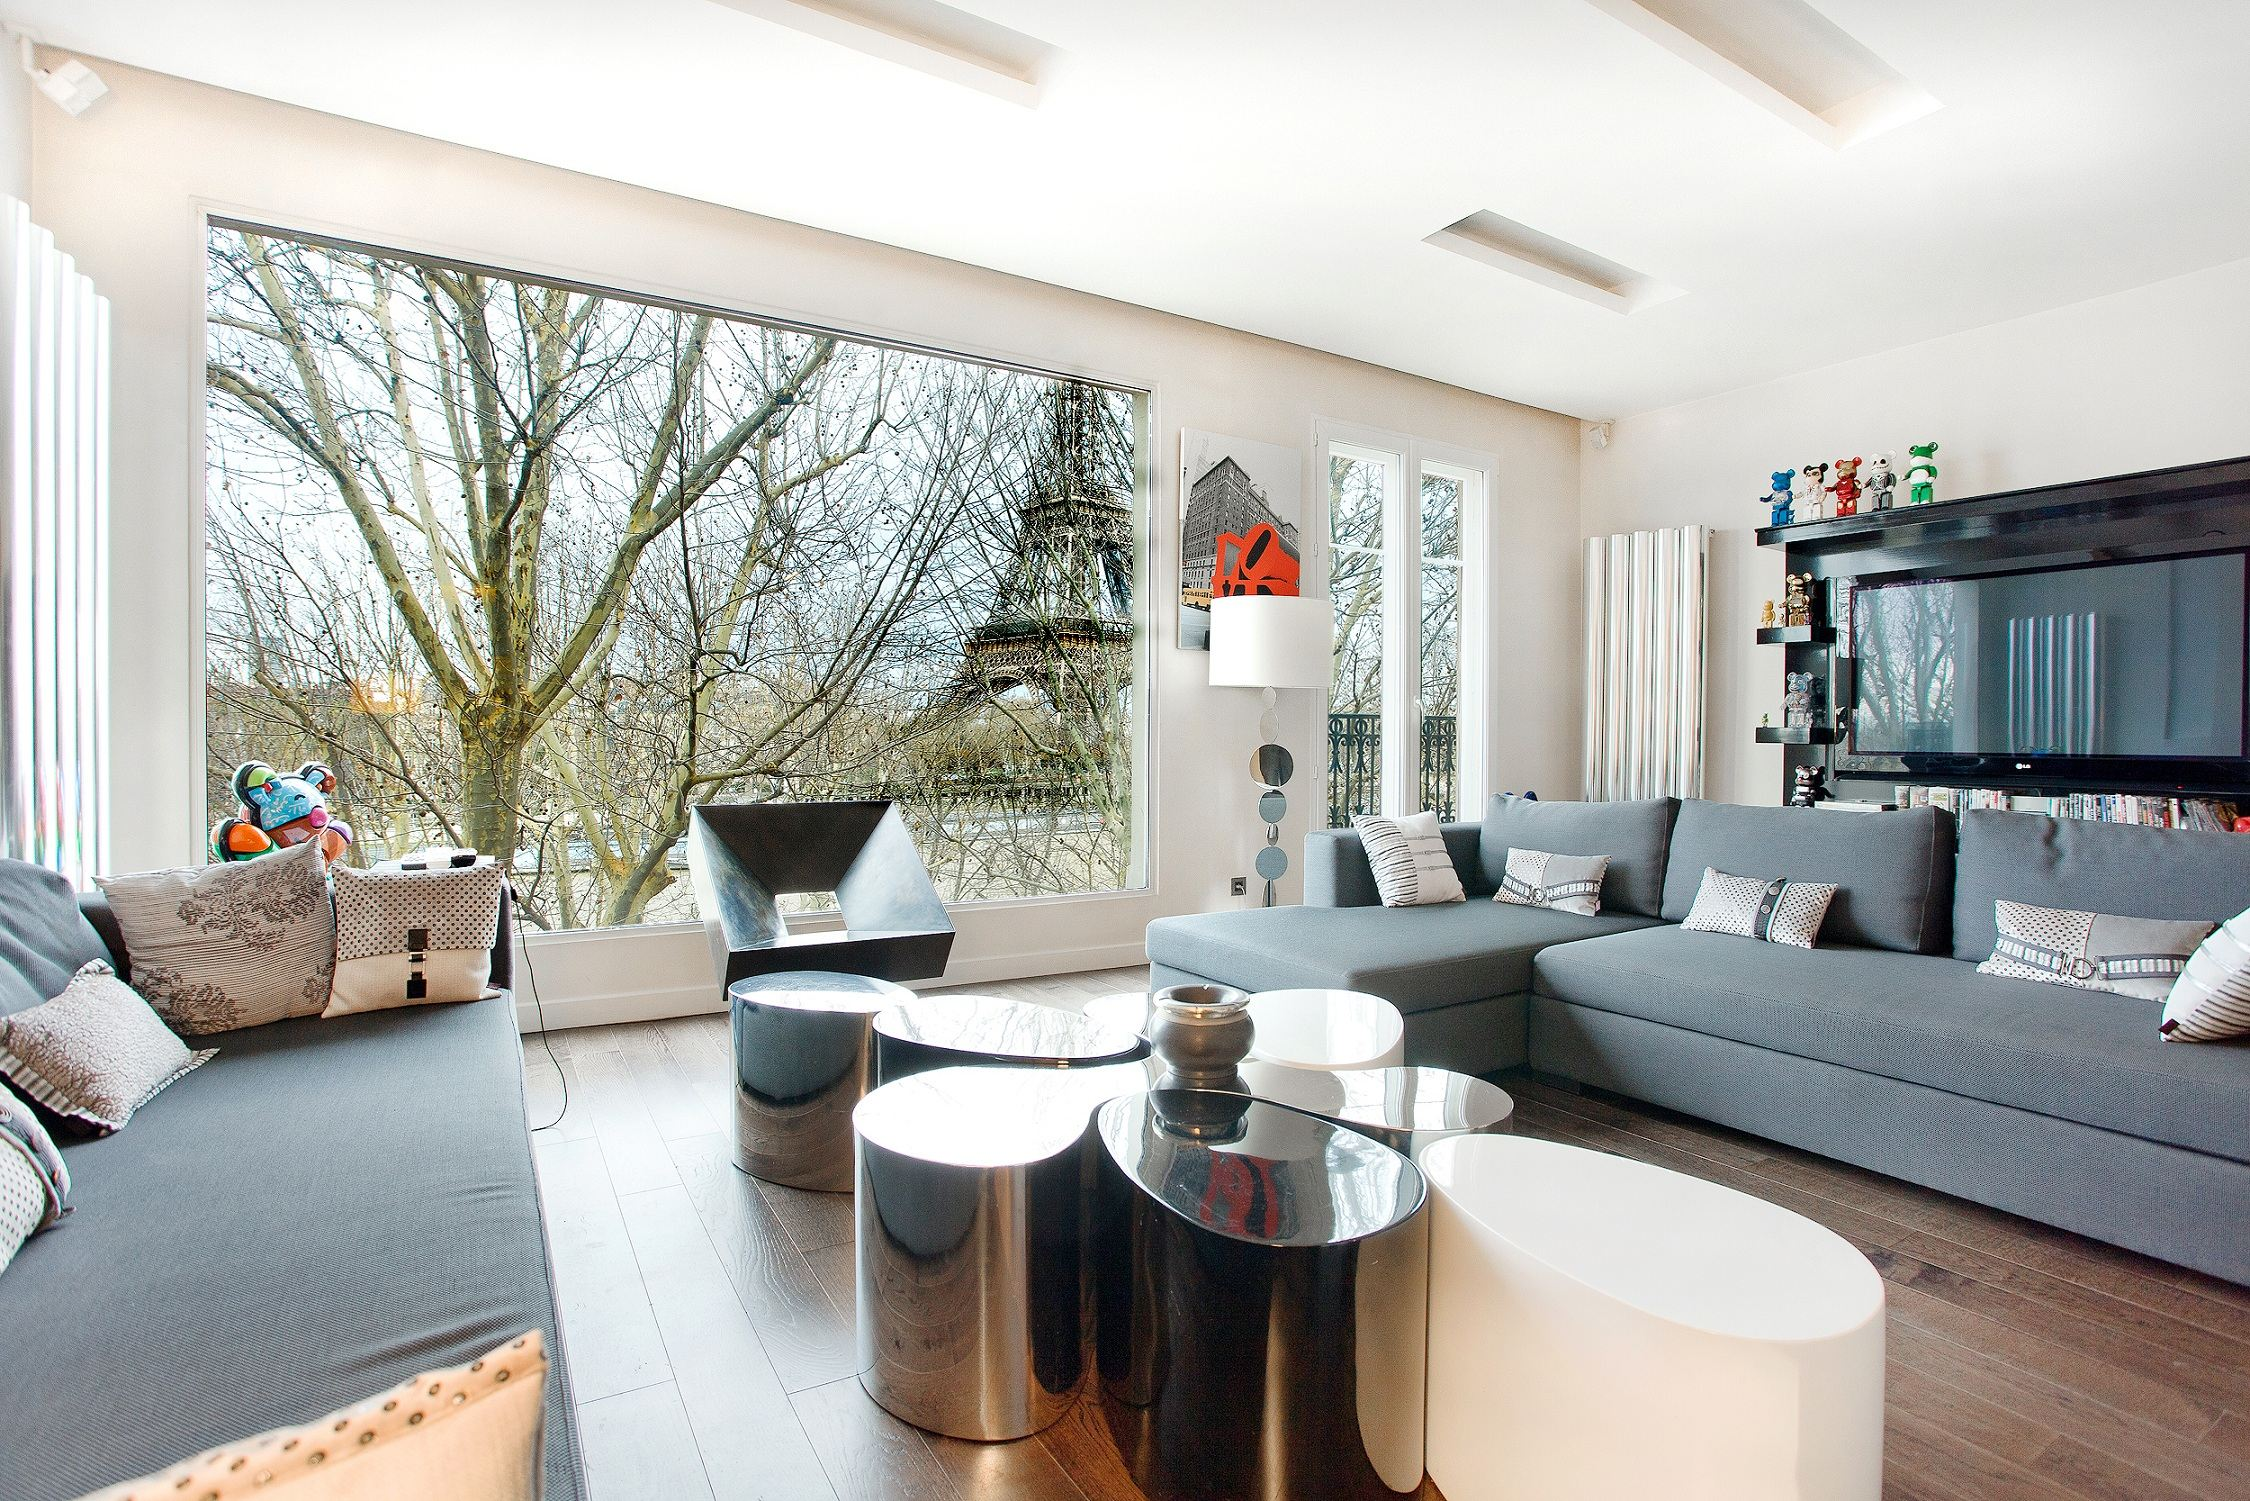 Property For Sale at Paris 16 - Eiffel Tower view. A 130 sq.m Apartment